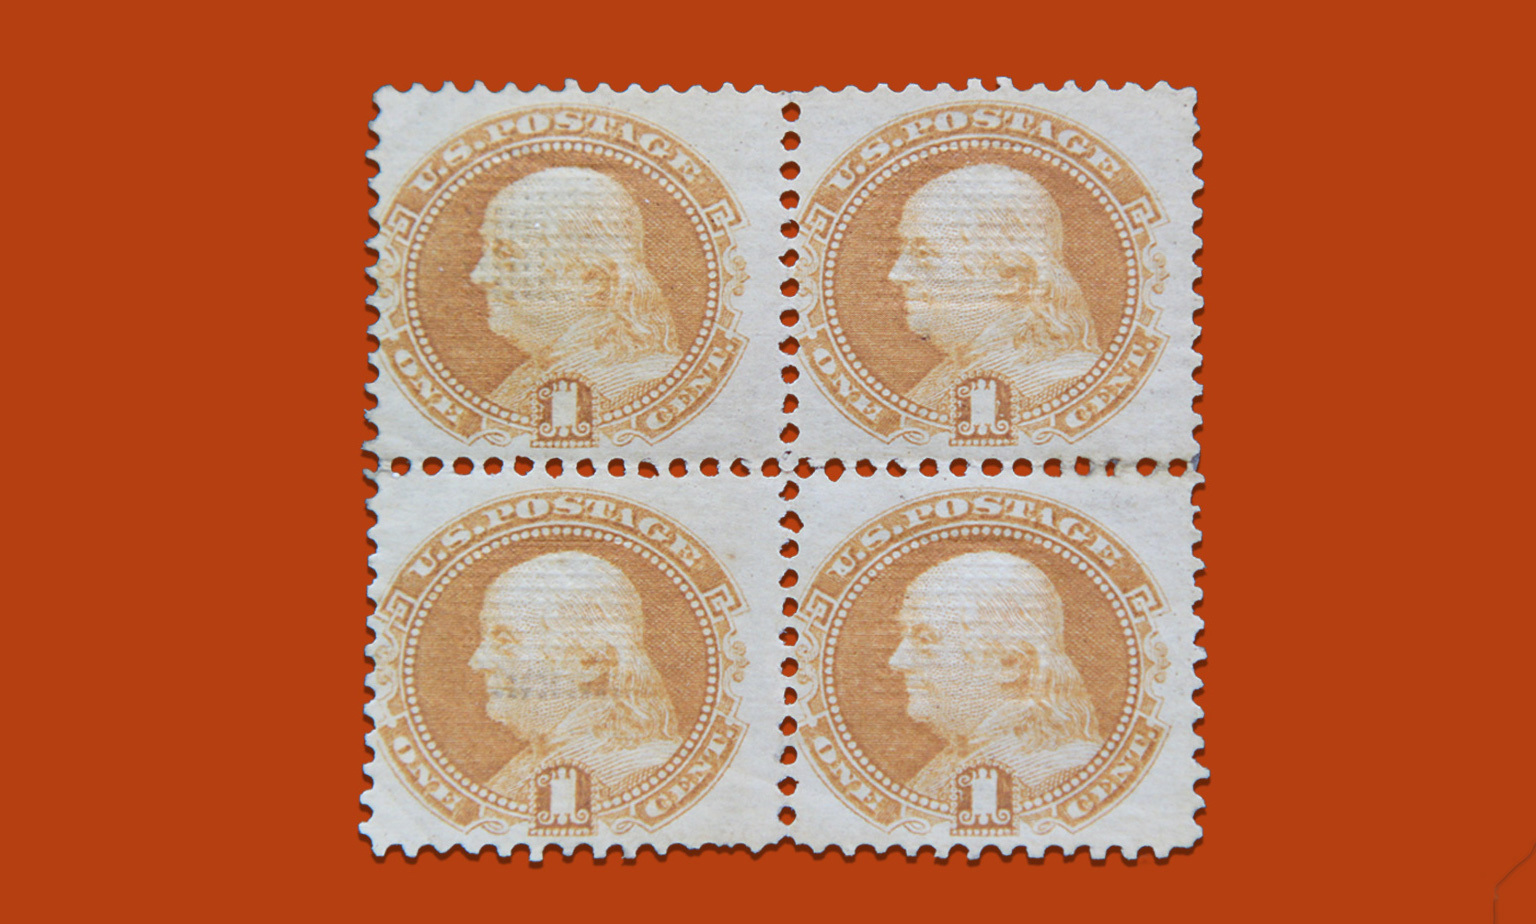 NobleSpirit July Stamp Auction